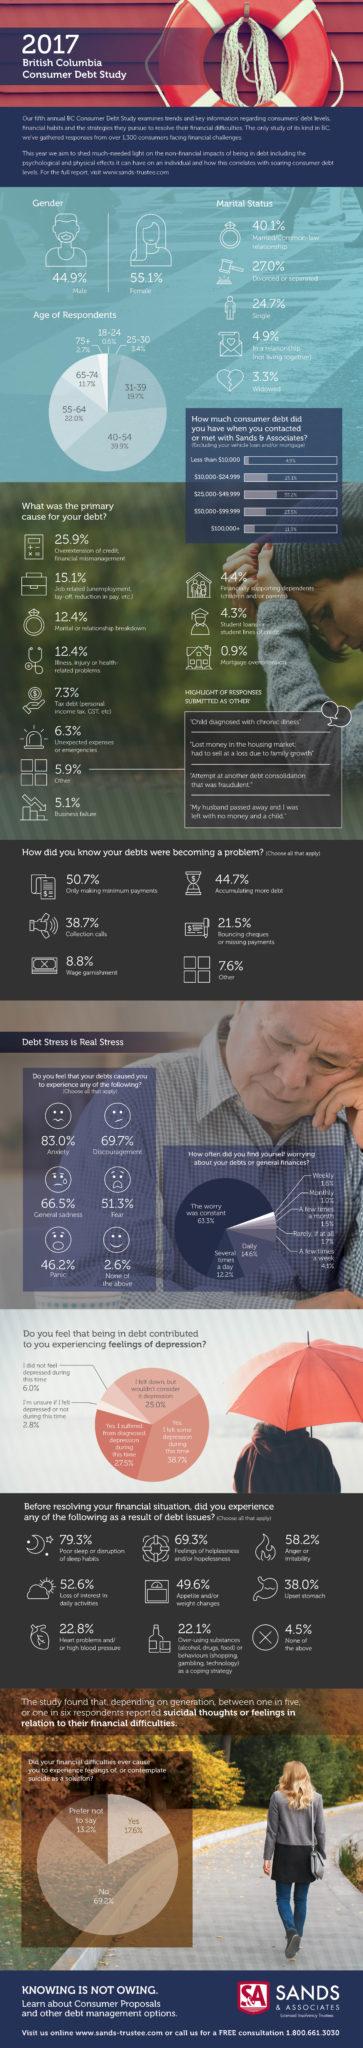 Consumer Debt Study 2017 - Sands & Associates